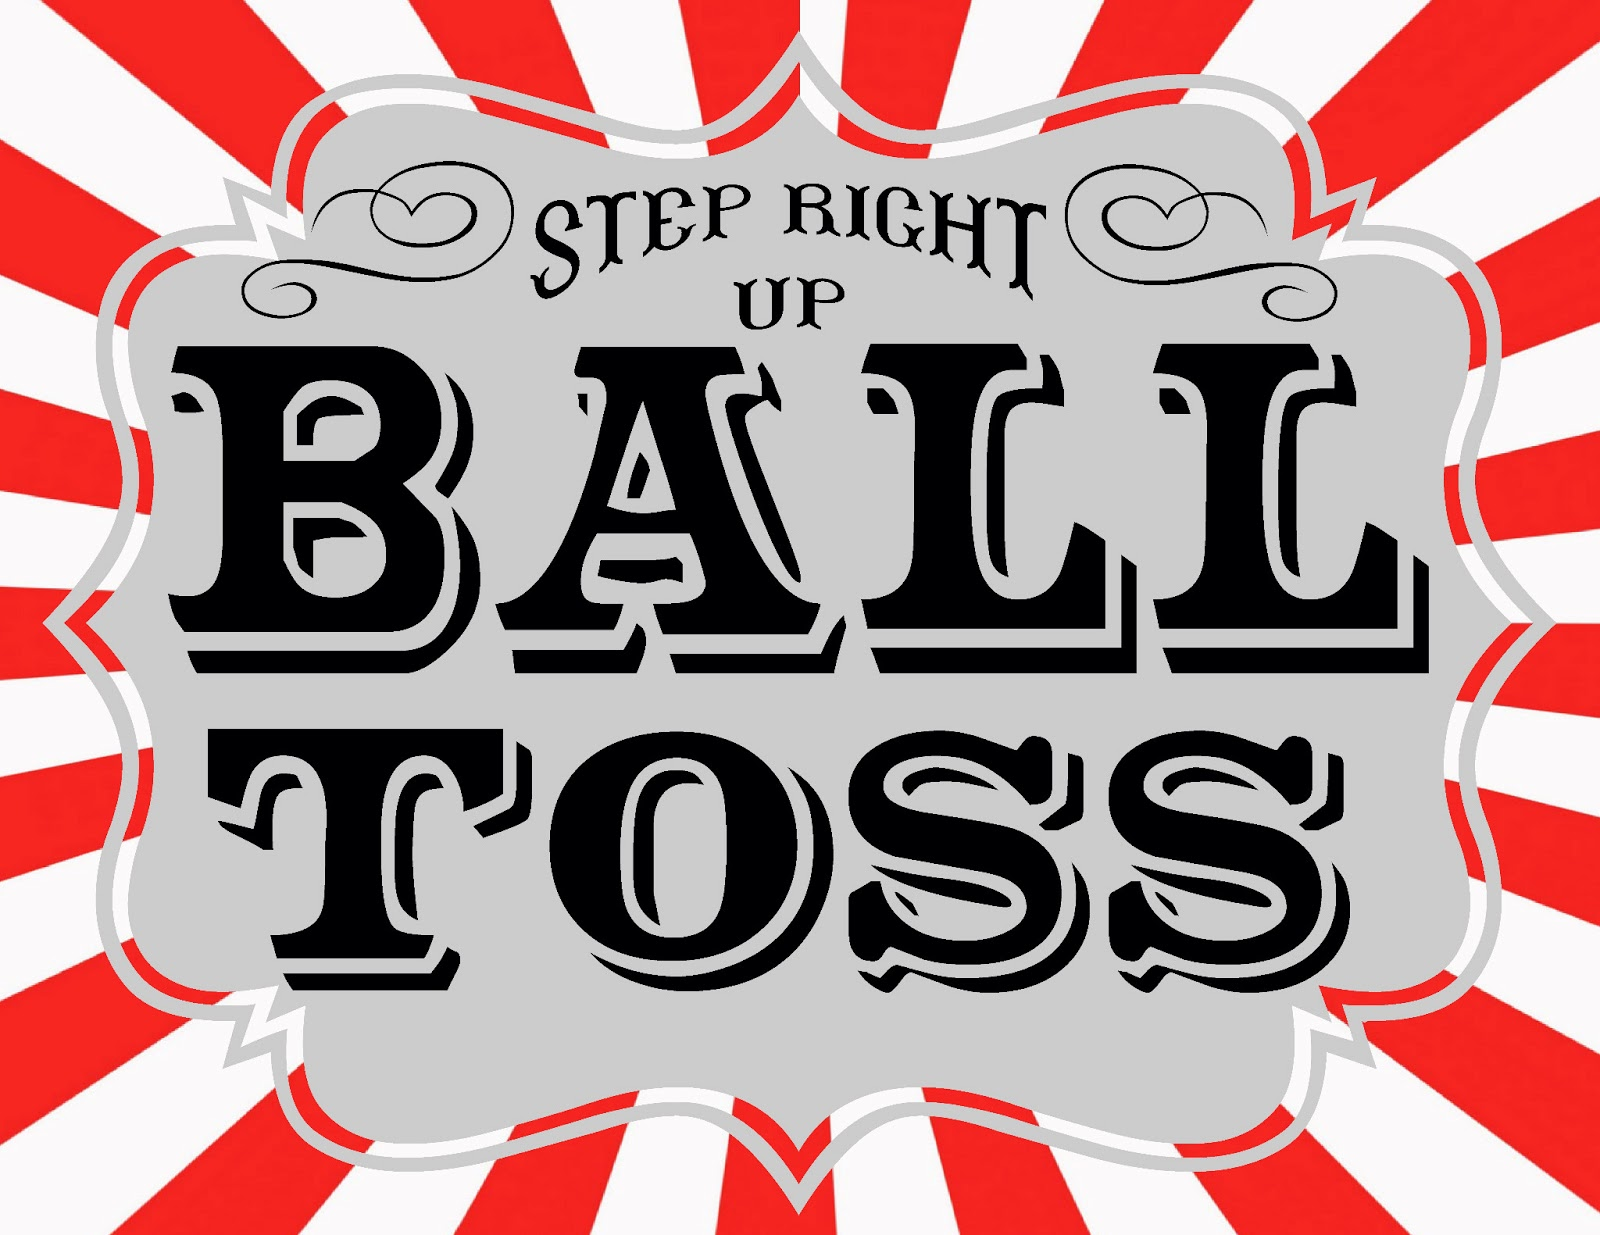 Game clipart football toss Signs Carnival ball+toss shy's Pinterest